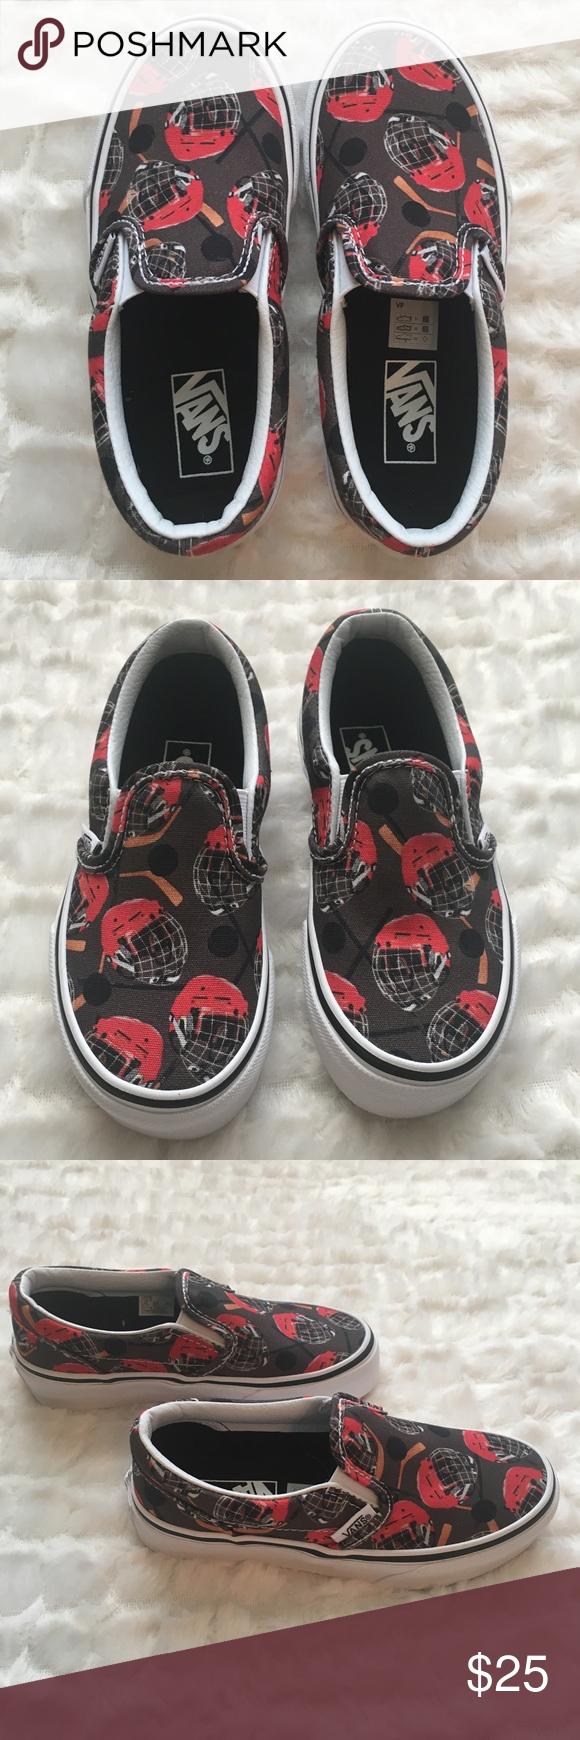 Boys Toddler Size 12 Hockey Vans Slip On Shoes Vans Classic Slip On Sneaker Grey Shoes